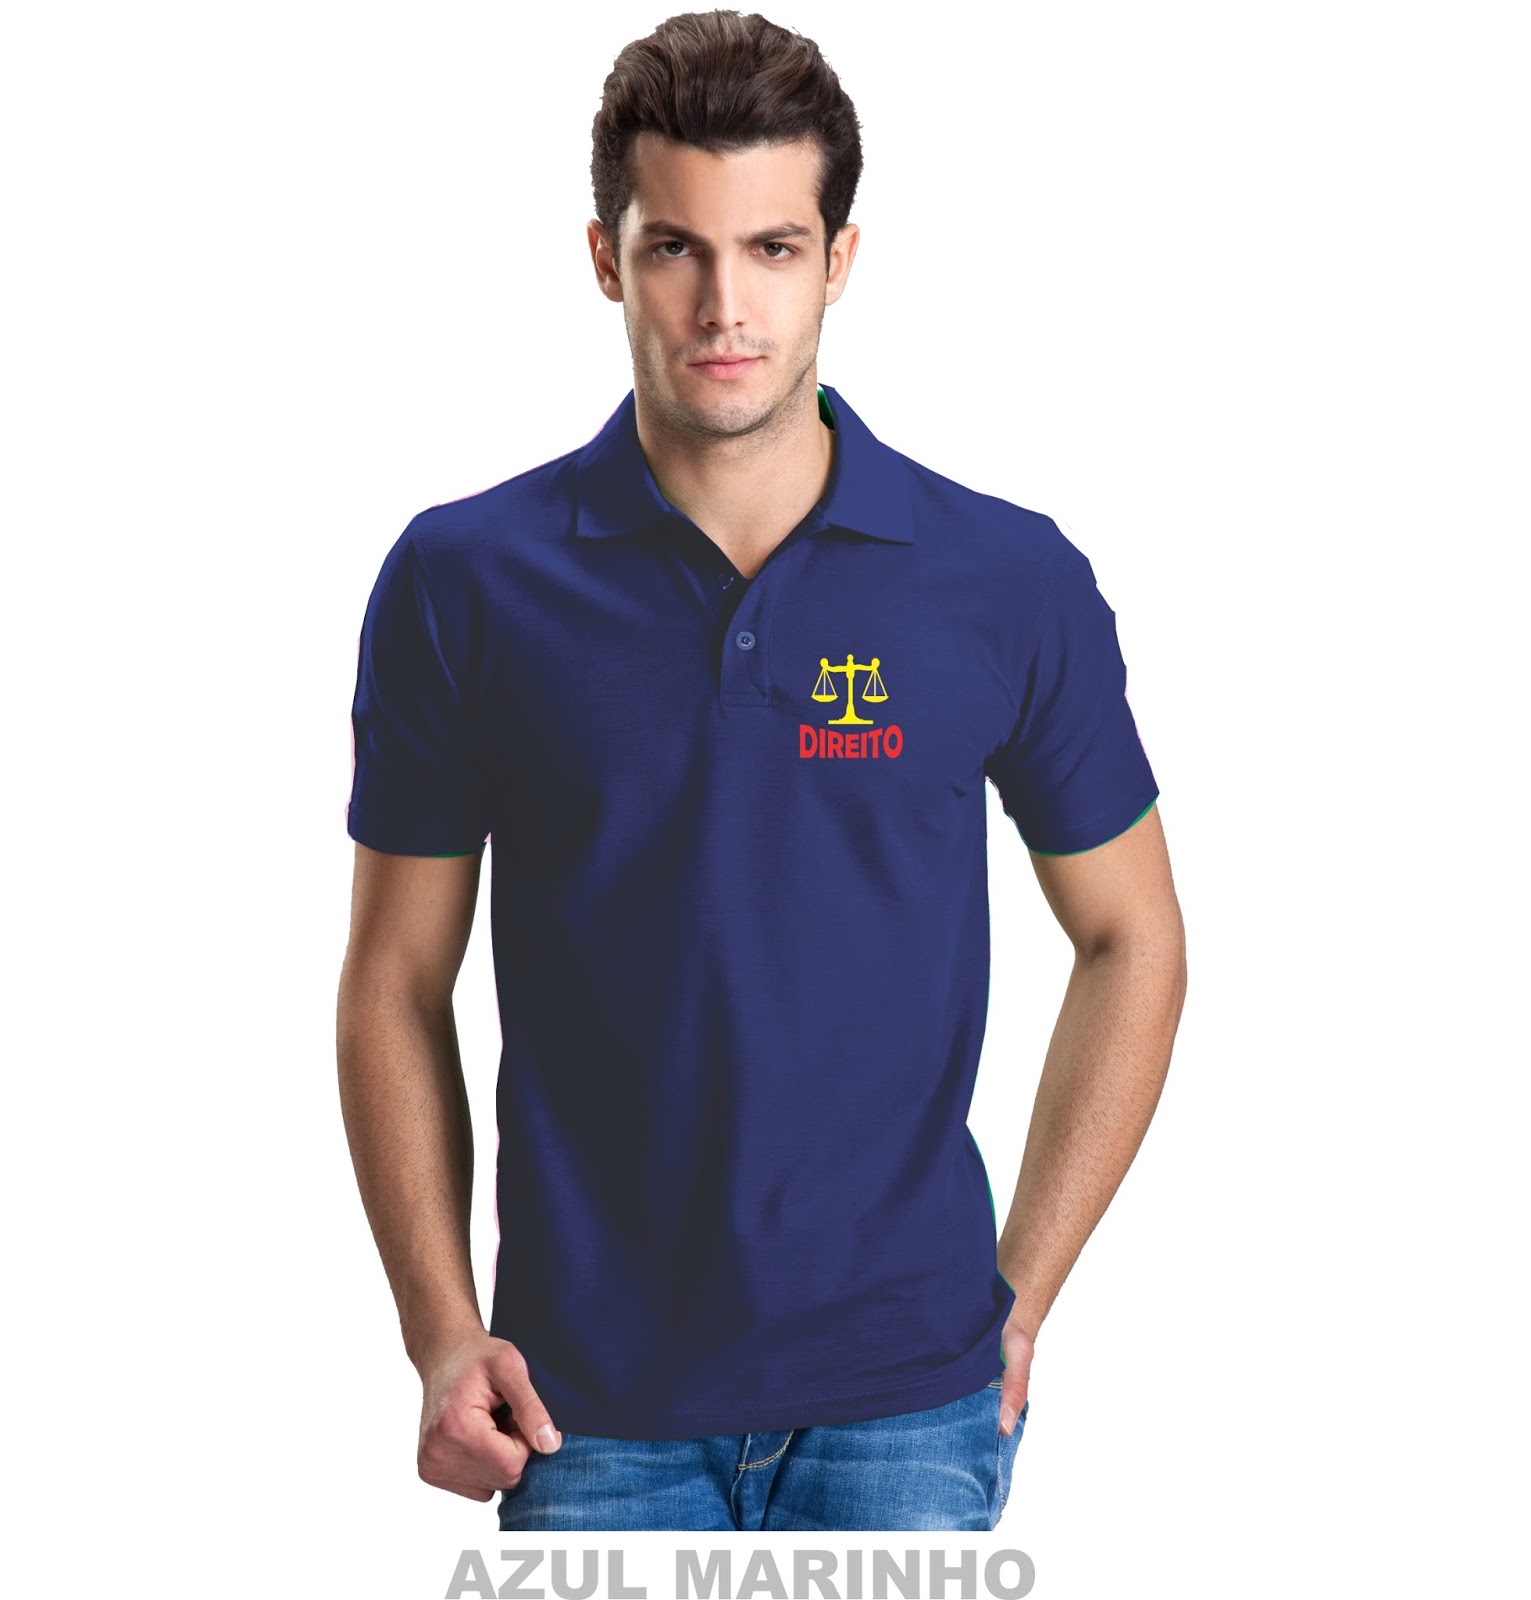 c9de8d468 camiseta direito